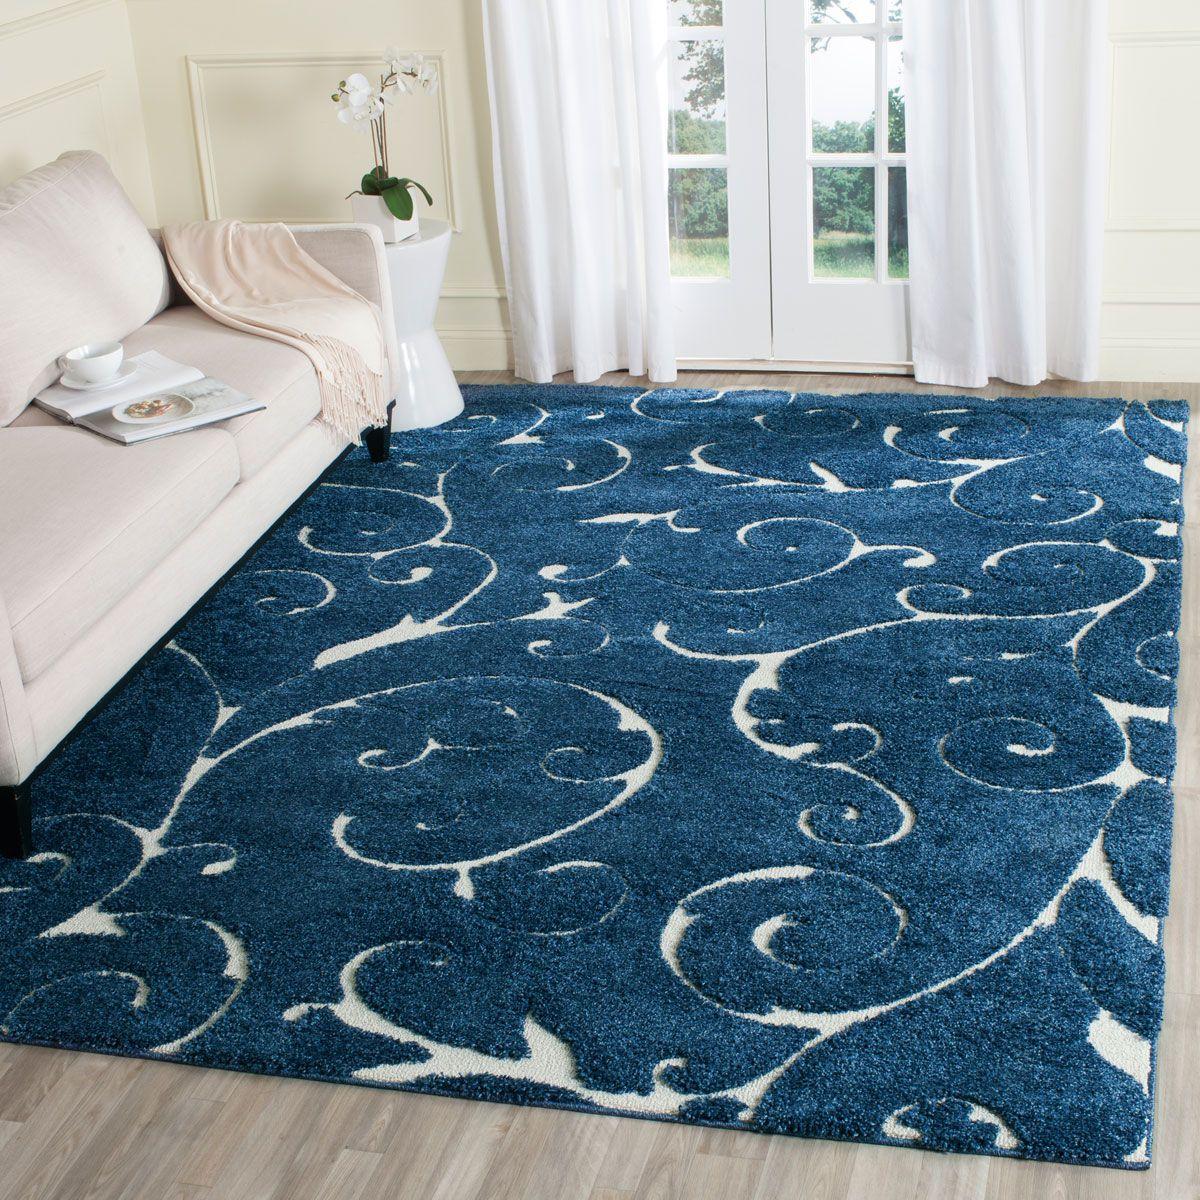 Shag Collection SG455-6511 Color: Light Blue / Cream  #rug #carpet #safavieh #safaviehrug  #trendy #homedecor #homeaccents #shophome #livingroom #diningroom #bedroom #kitchen #office #rugsforyourhome #shag #shagrug #shagcarpet #softshagrugs #shagrugdesign #stunningshagrugs #safaviehshag #safaviehshagrugs #trendyrugs #bestrugs #bestrugprices